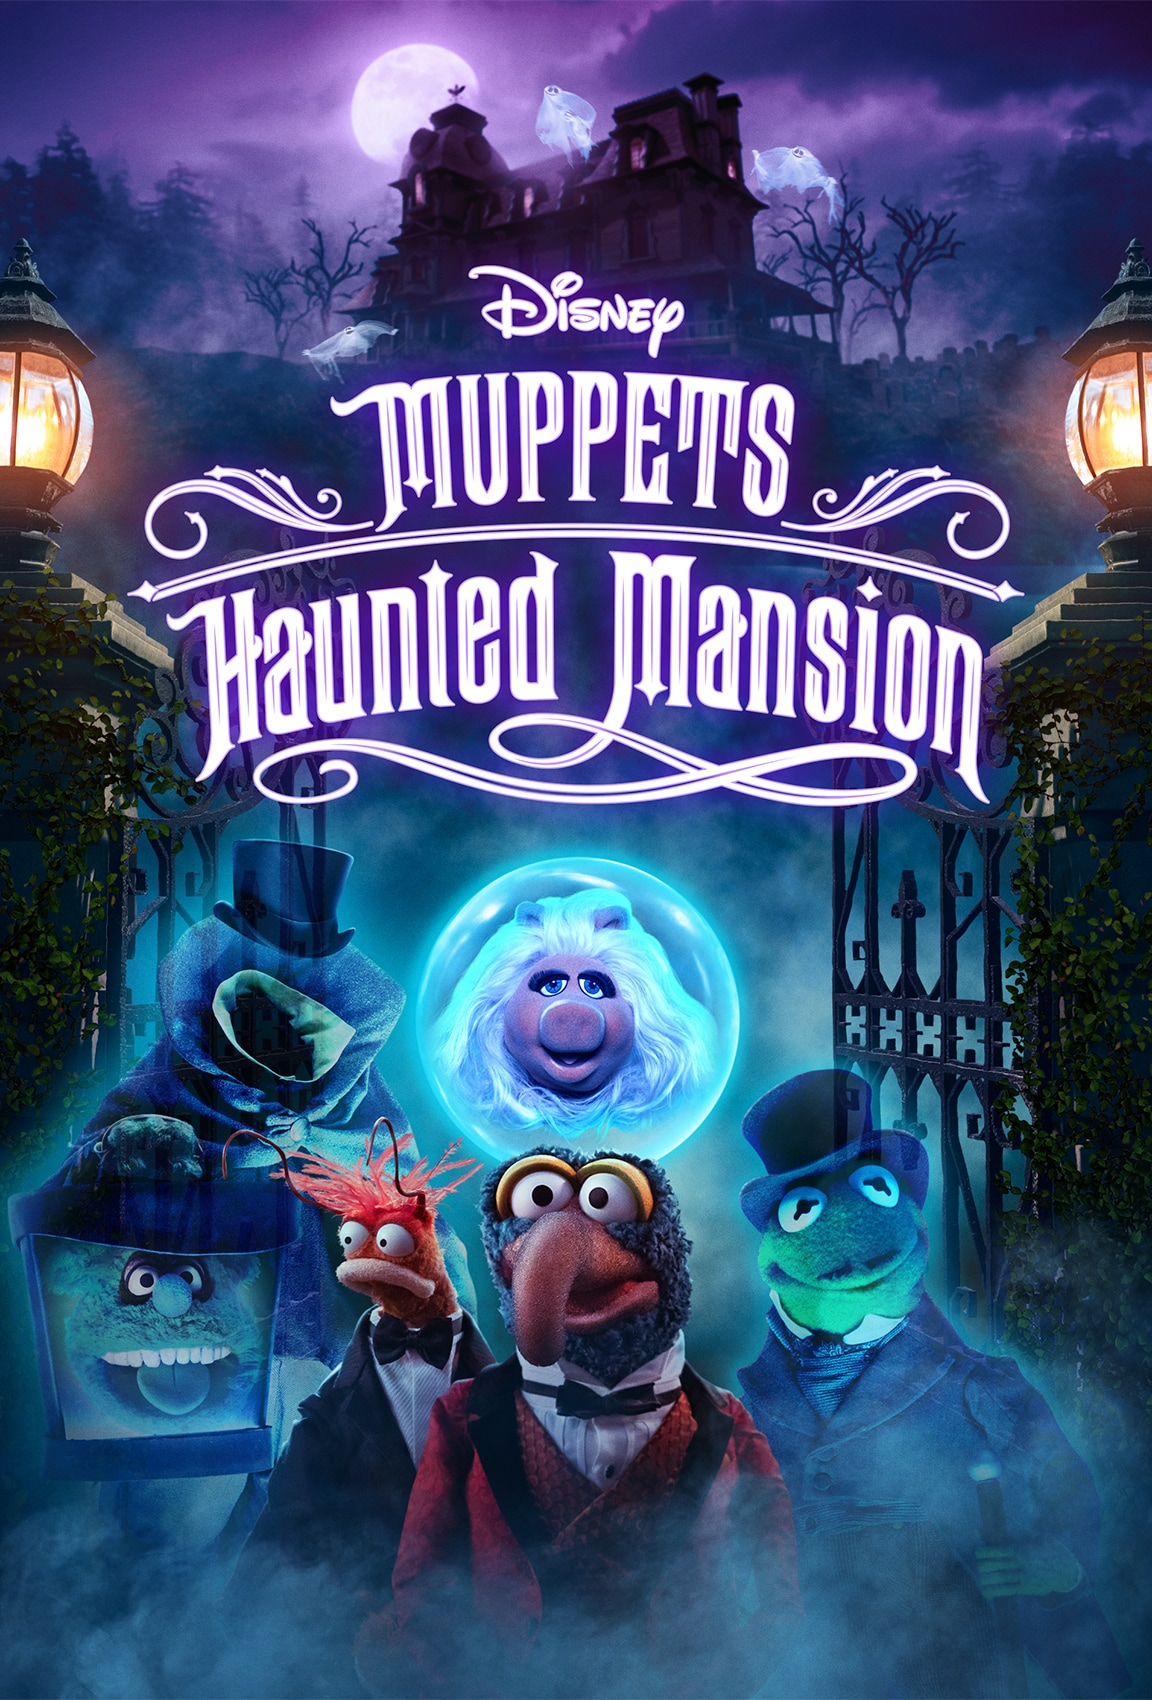 Muppets Haunted Mansion on Disney Plus